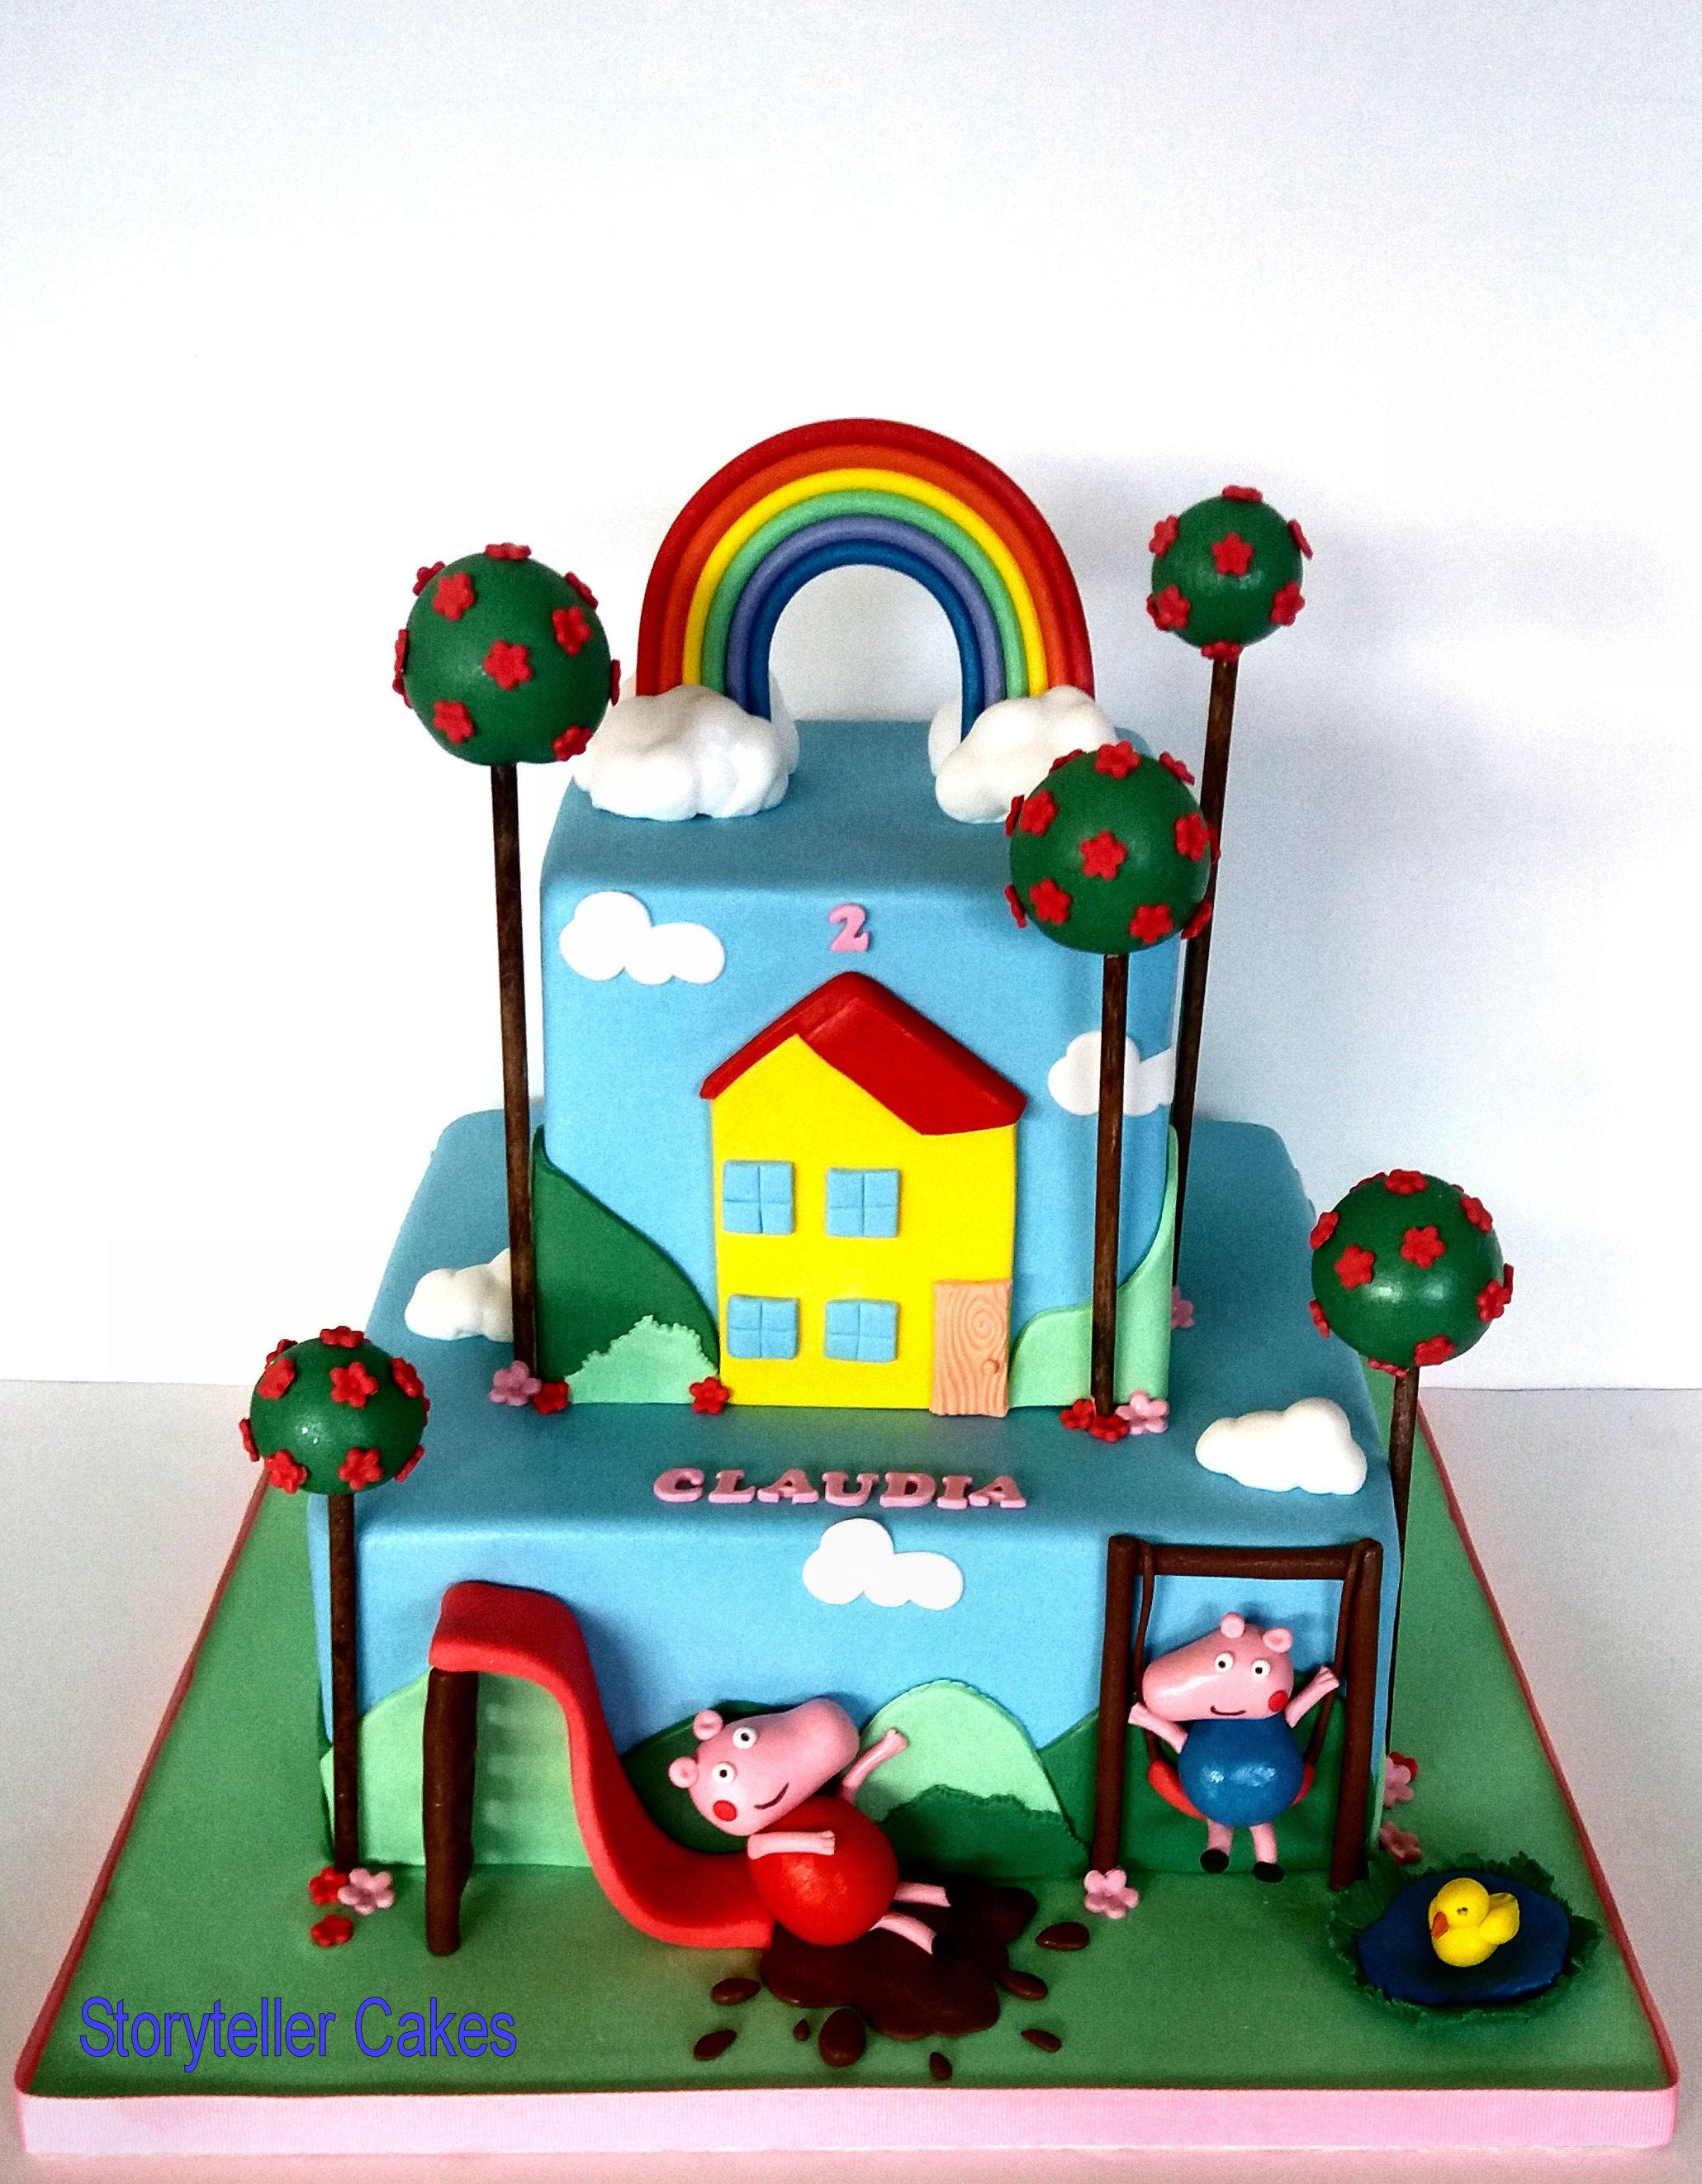 Pepa Pig Birthday Cake1.jpg